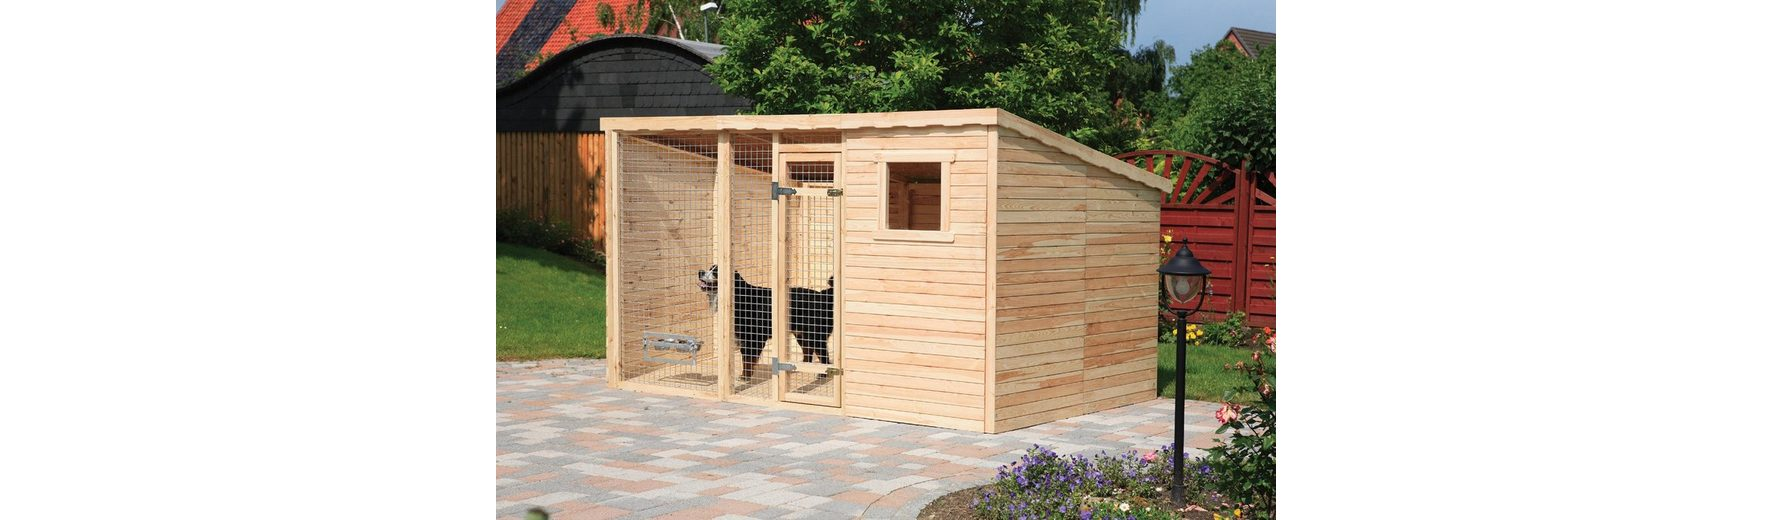 Hundezwinger, Grundfläche: 8,8 m²